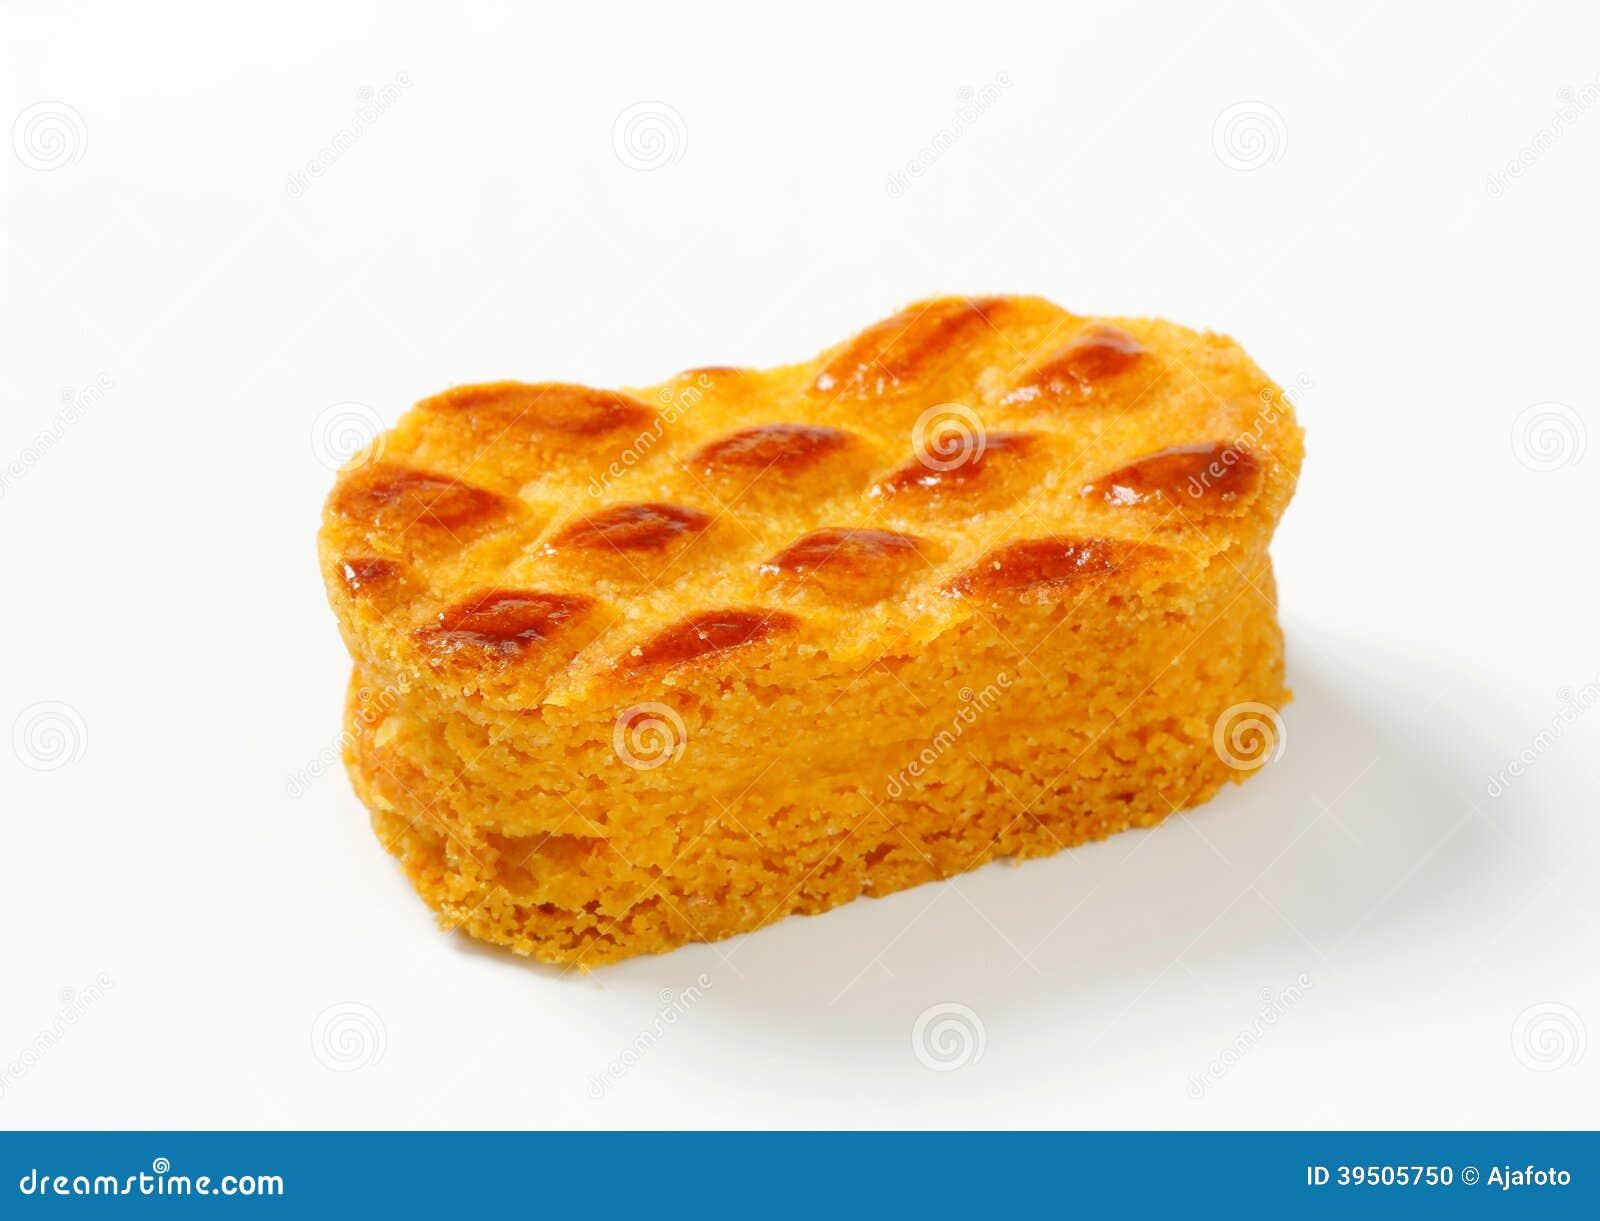 Small oval-shaped cake